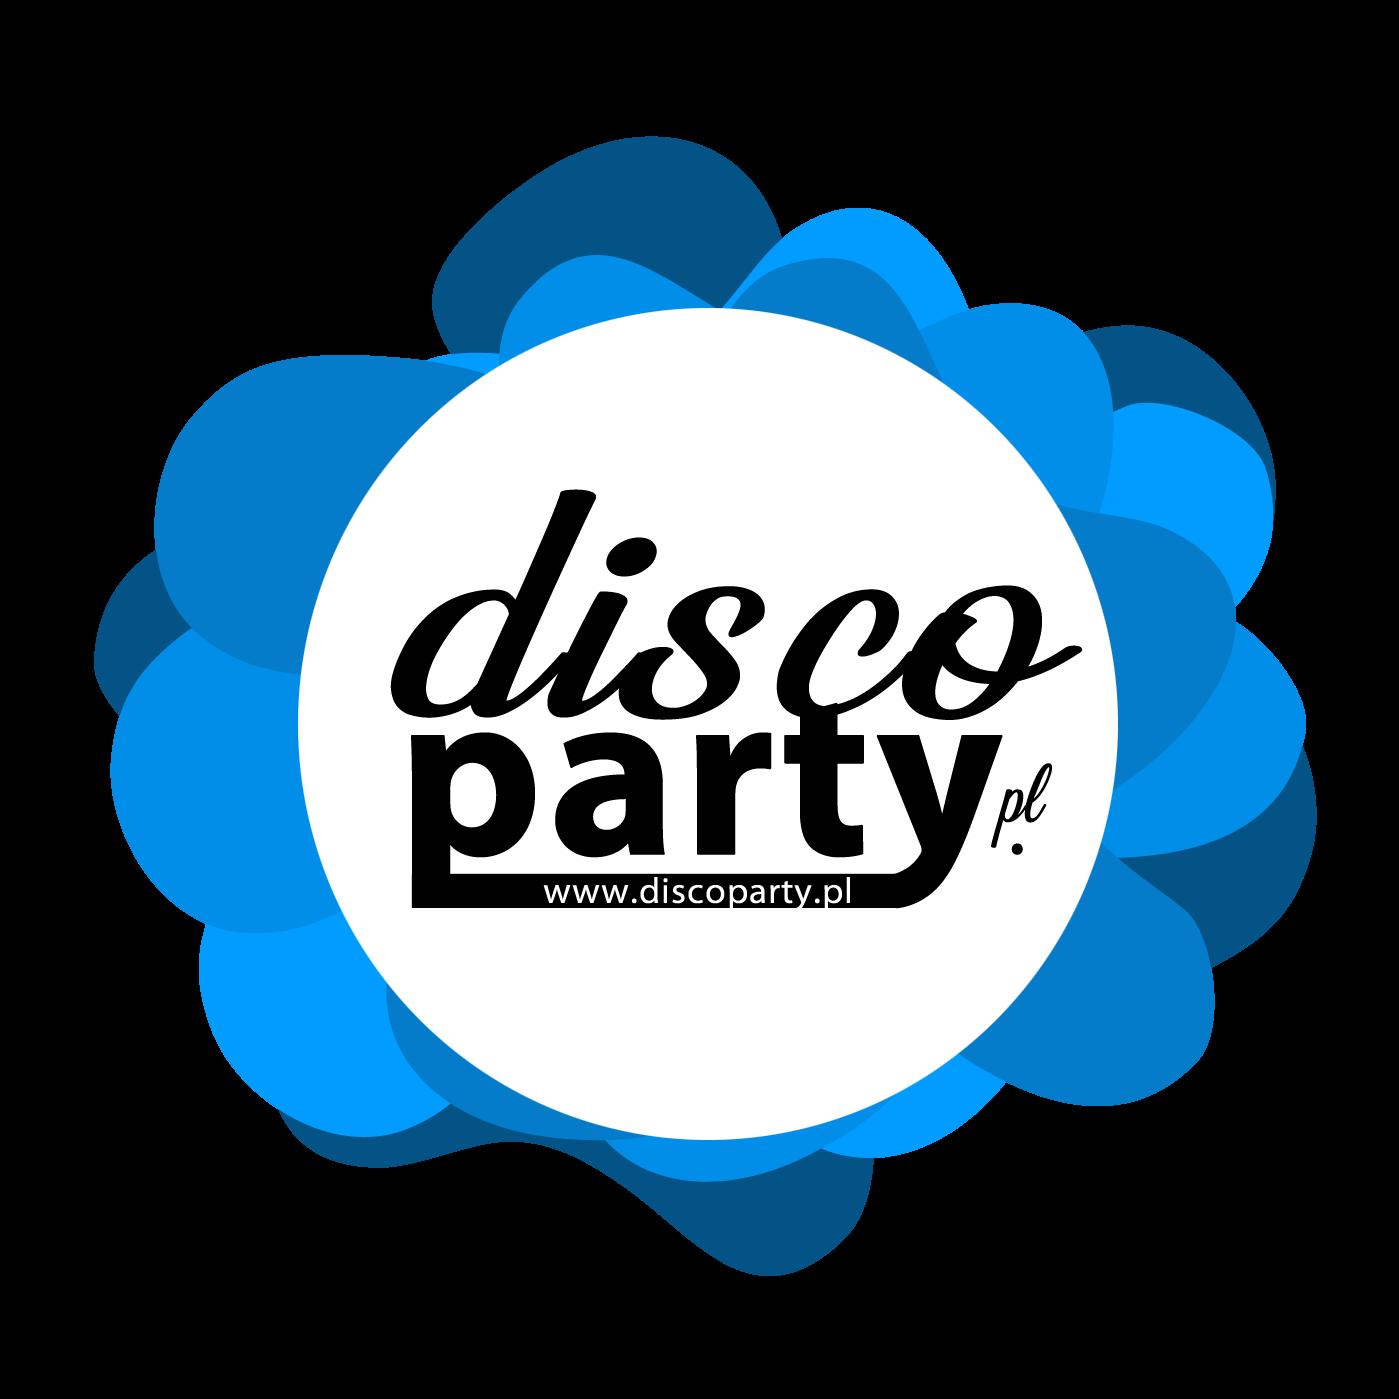 DiscoParty.pl - Club!